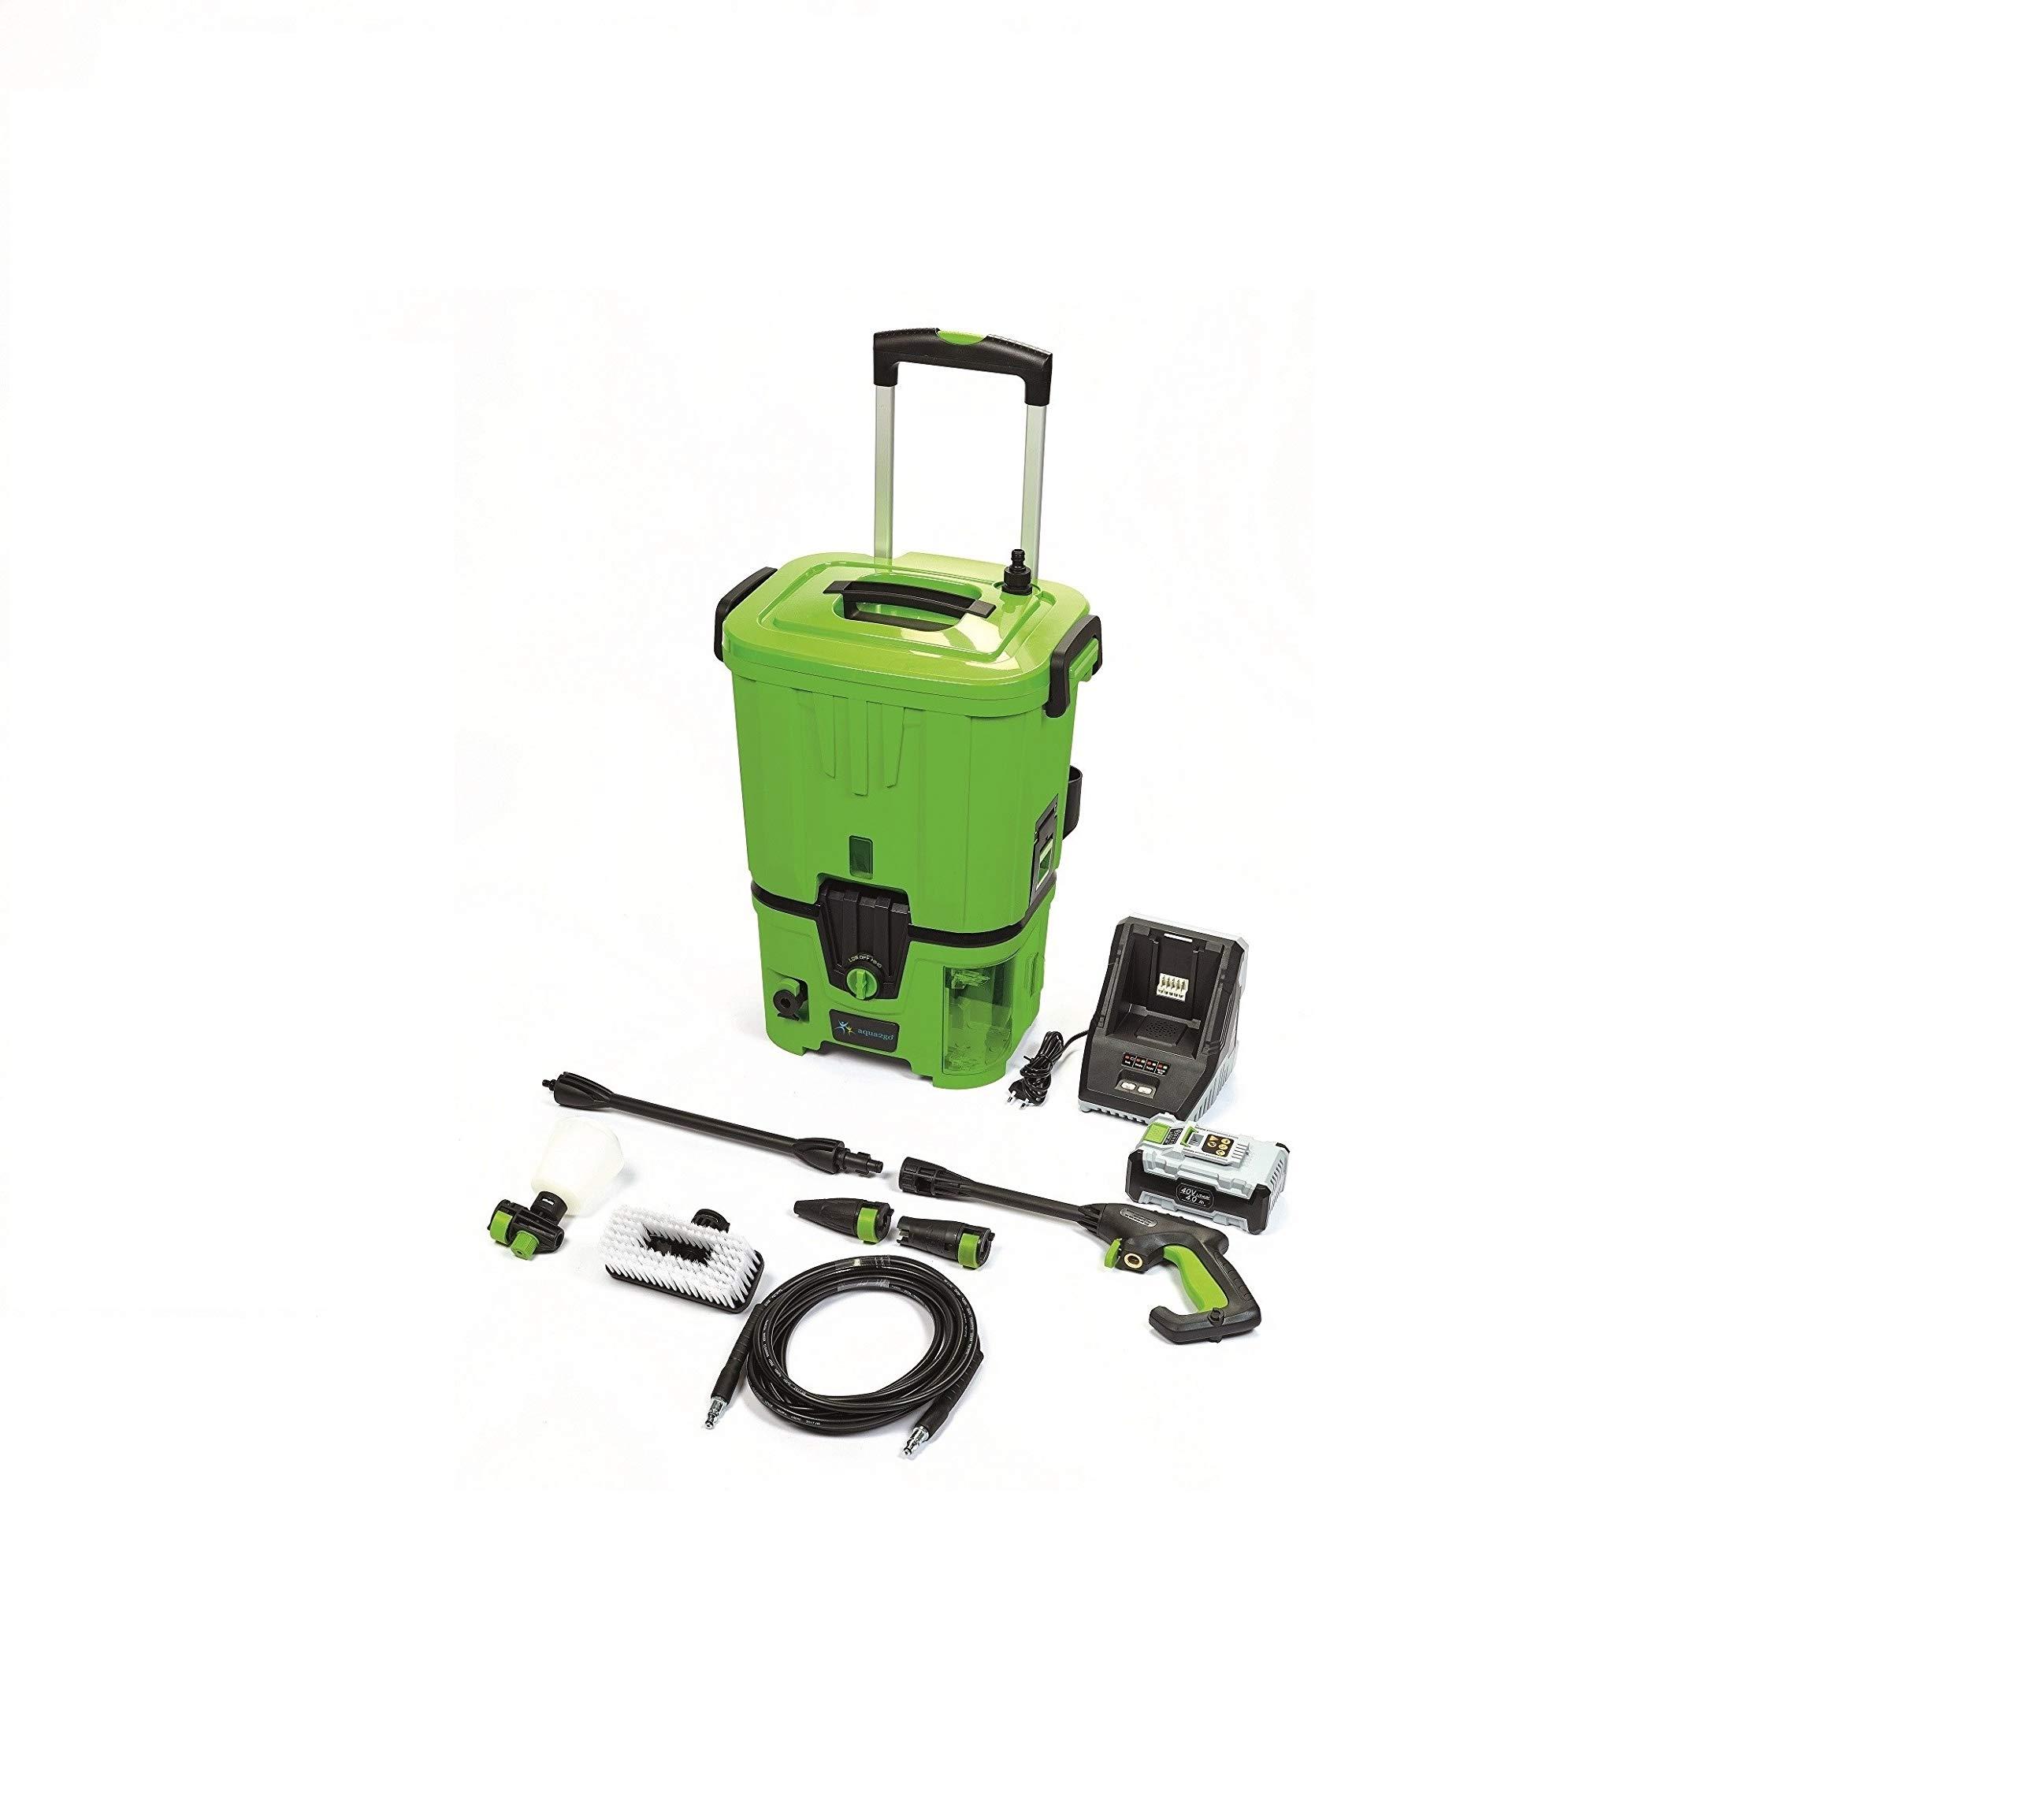 Aqua2go-GD650-KROSS-Mobile-Akku-Hochdruckreiniger-Grn